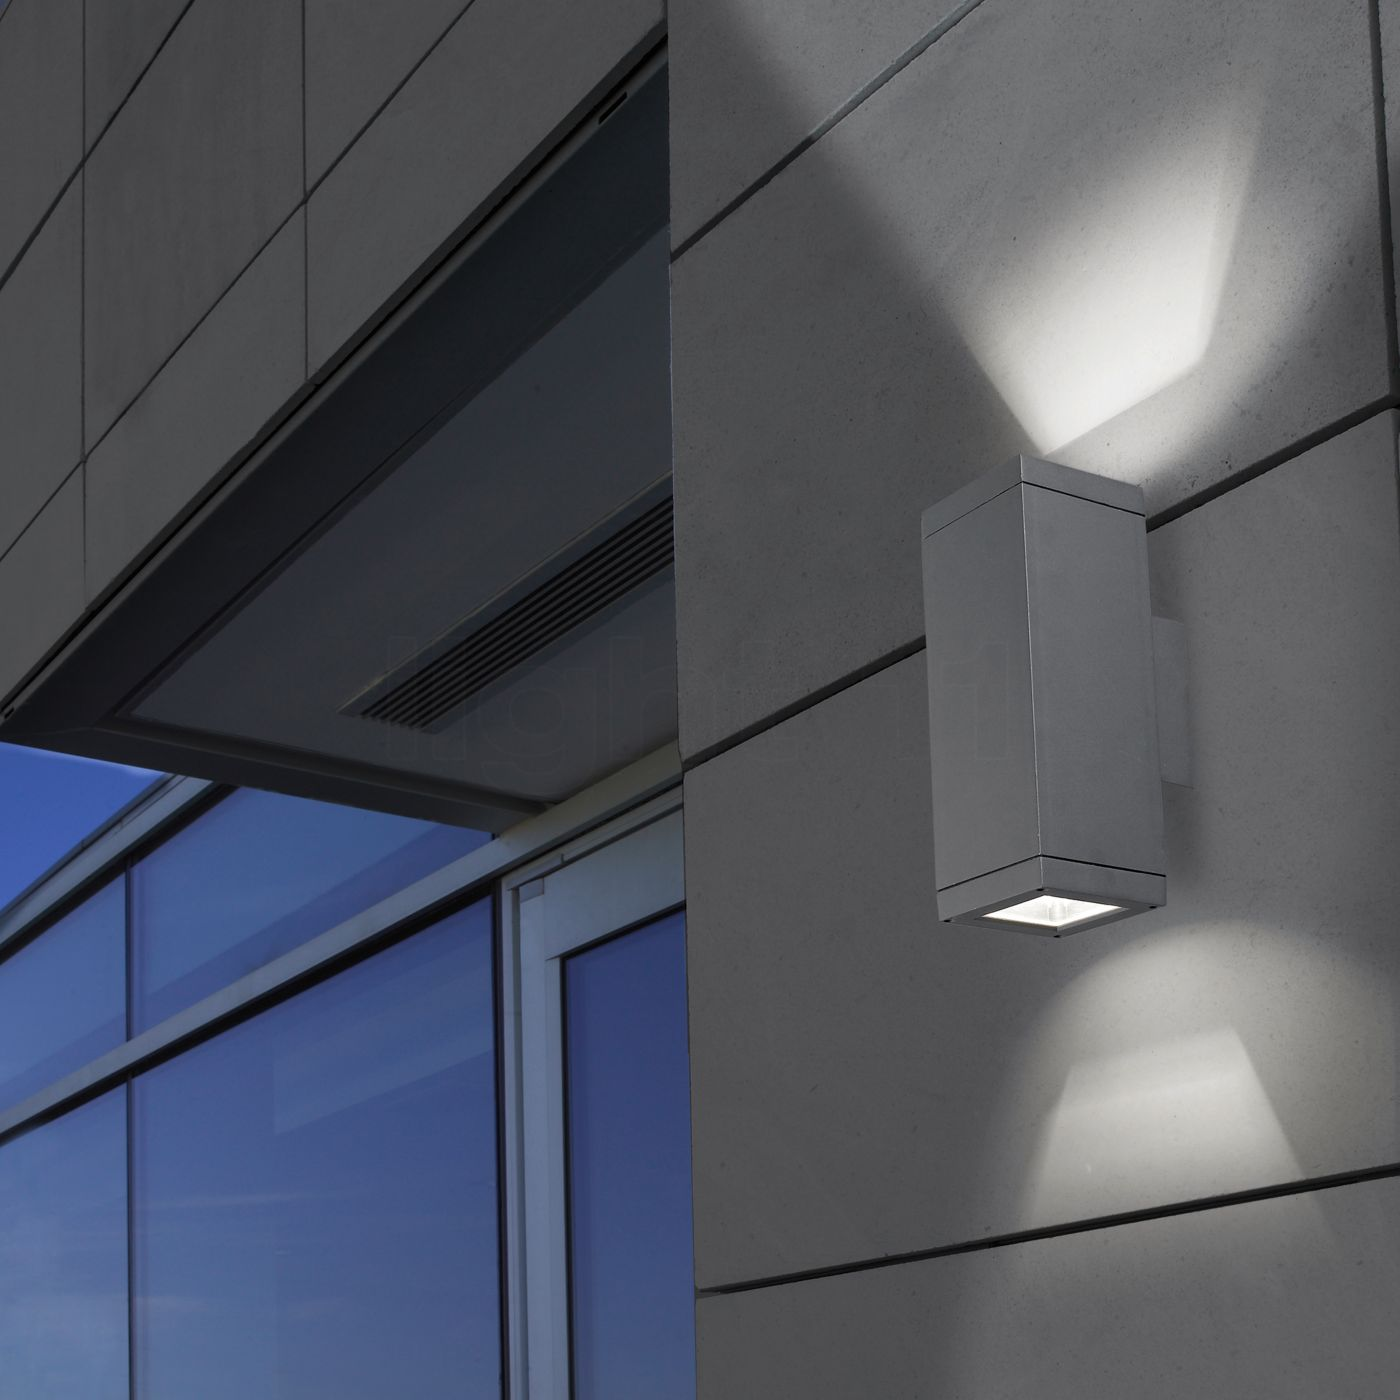 LEDS_C4_Afrodita_PAR_30_Up__Down_Vaeglampe--977d685204089214f675f1b9863da076 Faszinierend Up Down Lampe Dekorationen